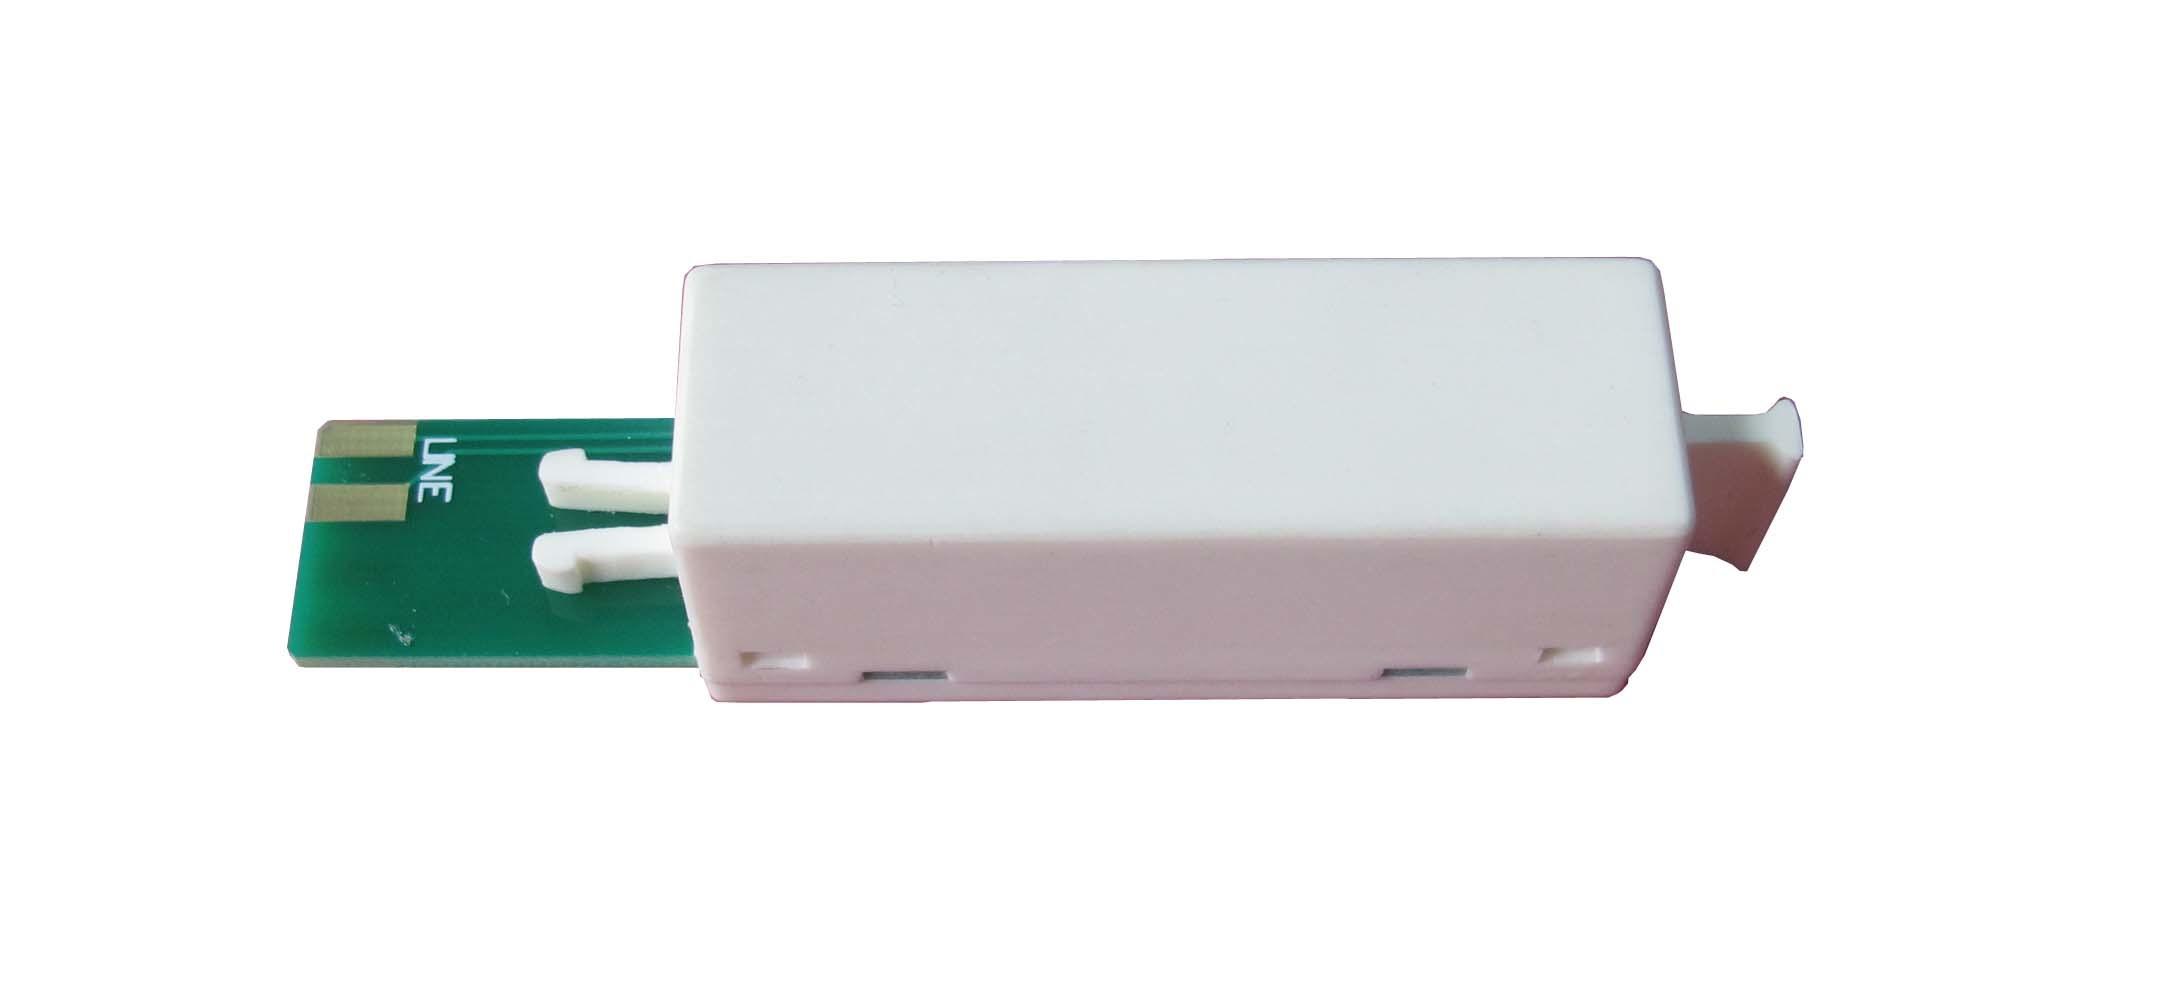 ADSL2+ Splitter for Kt & PT Terminal for Iran Market